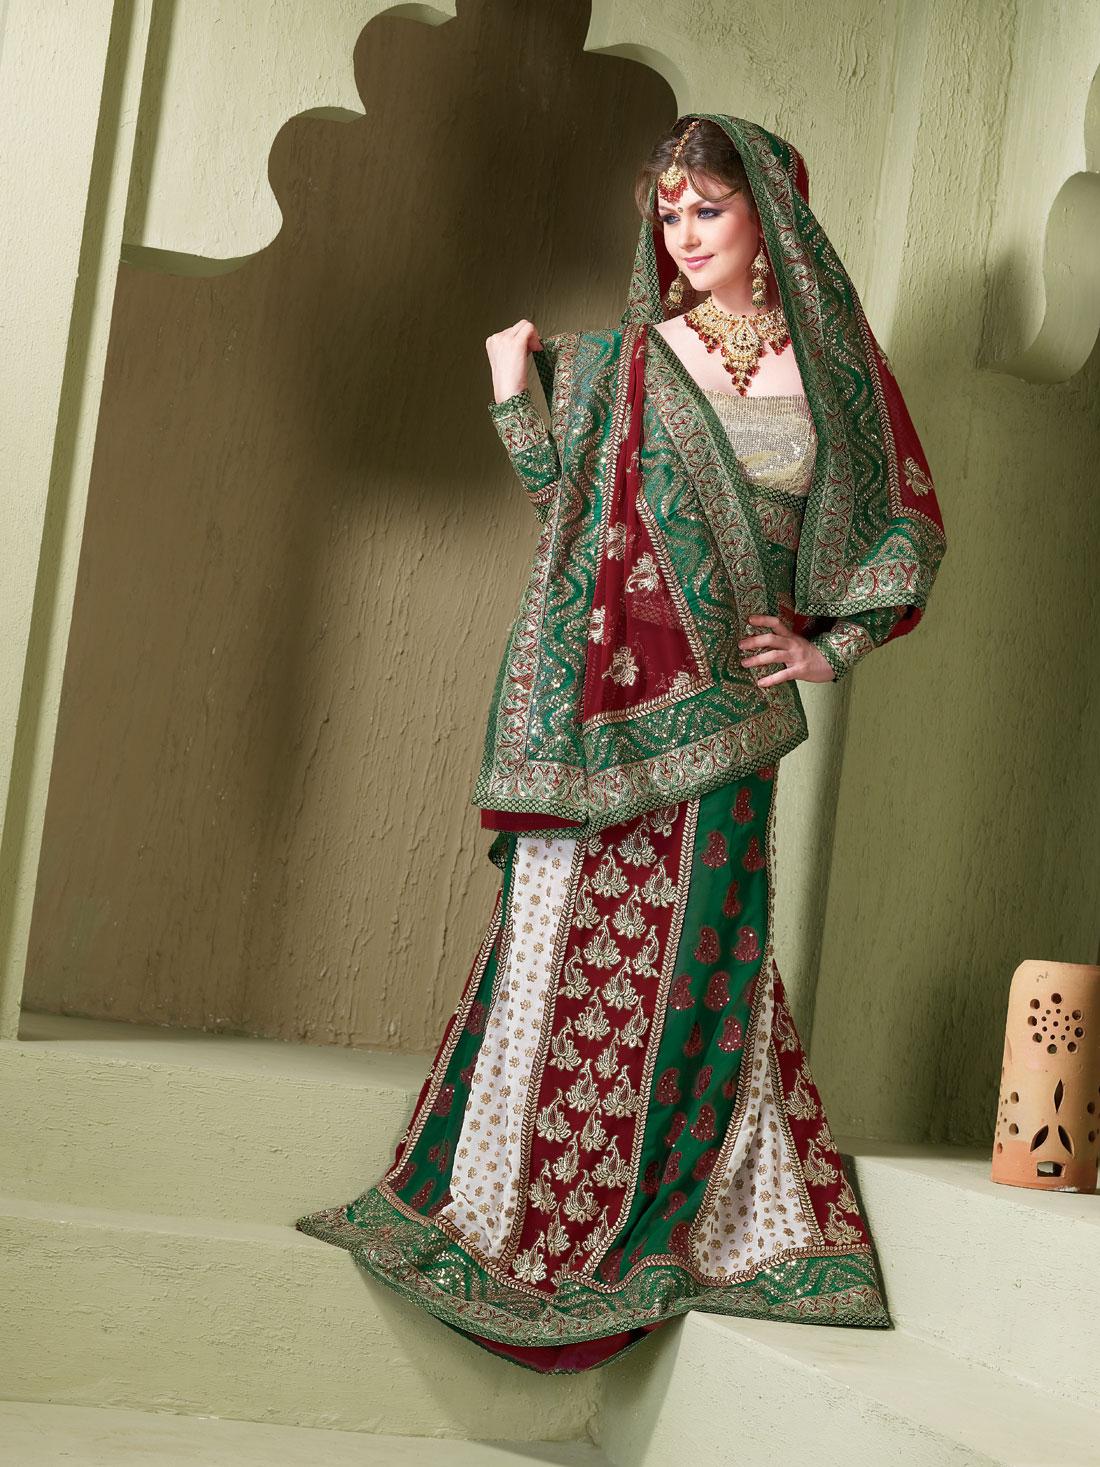 indian wedding centerpieces